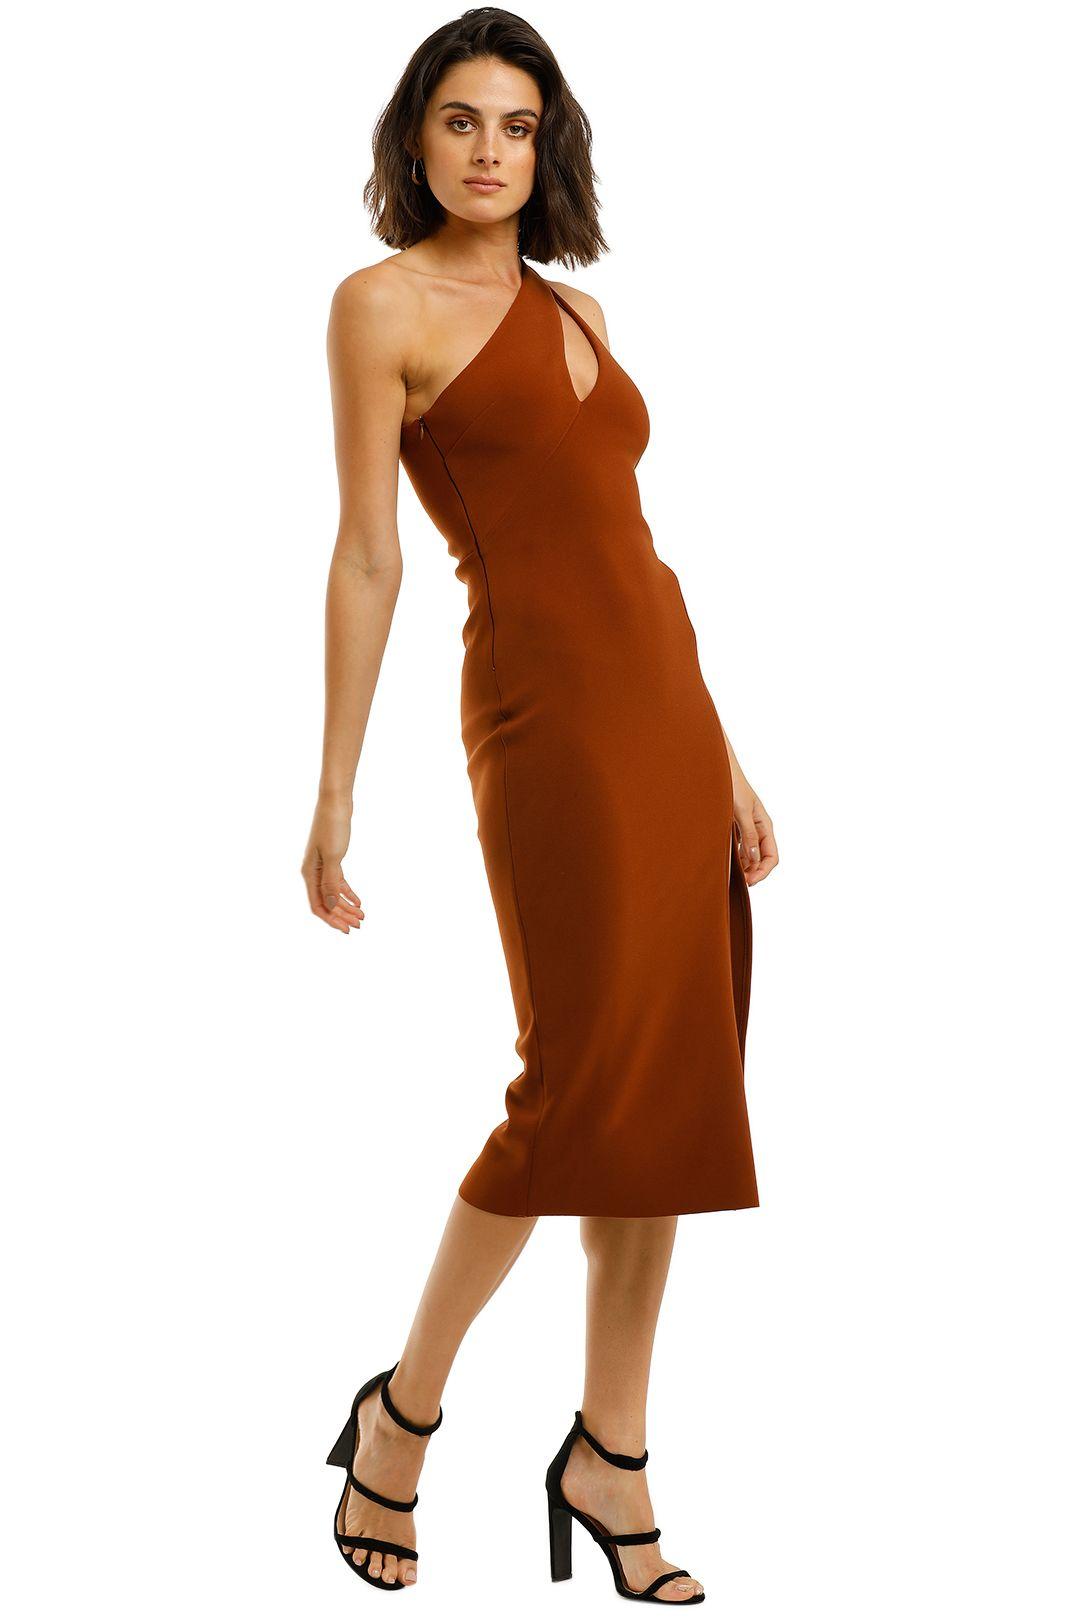 Bec-and-Bridge-Emerald-Avenue-Asymmetric-Midi-Dress-Copper-Side